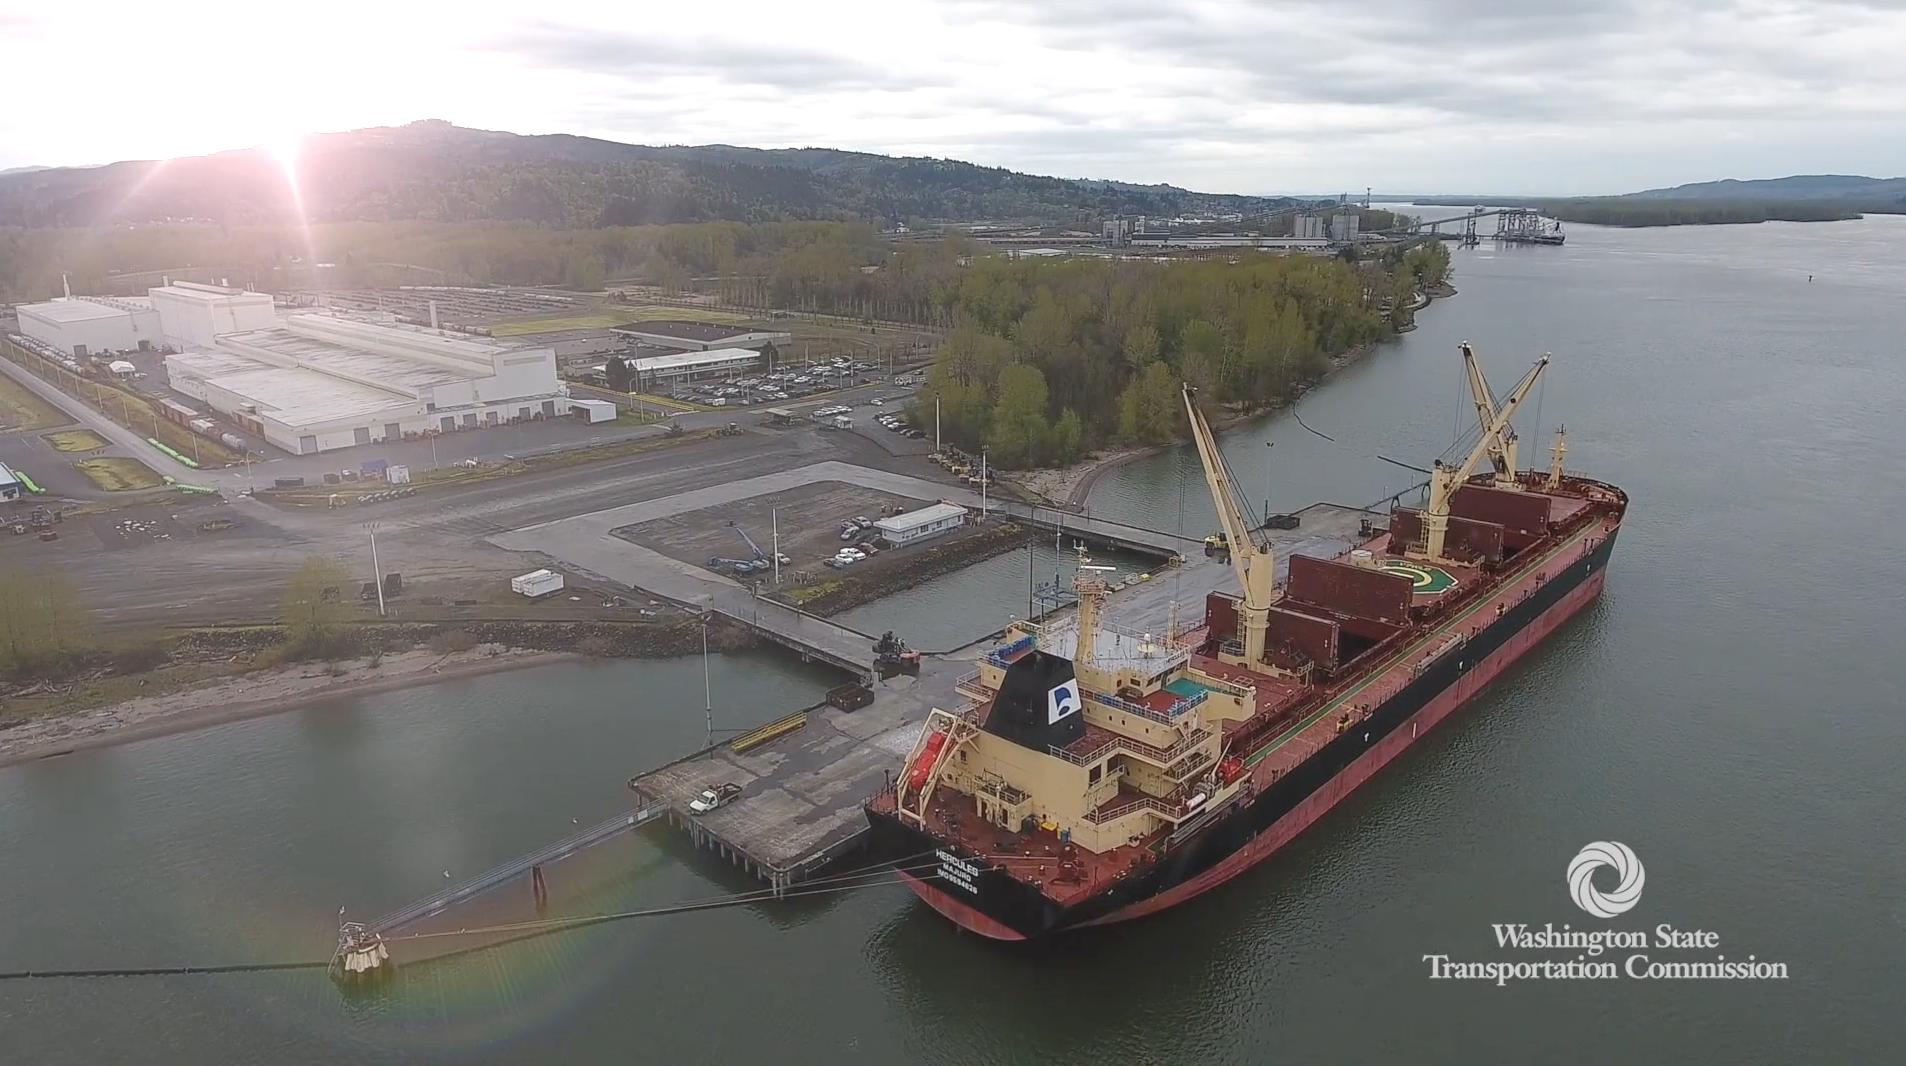 Loading cargo ship at port in Washington State